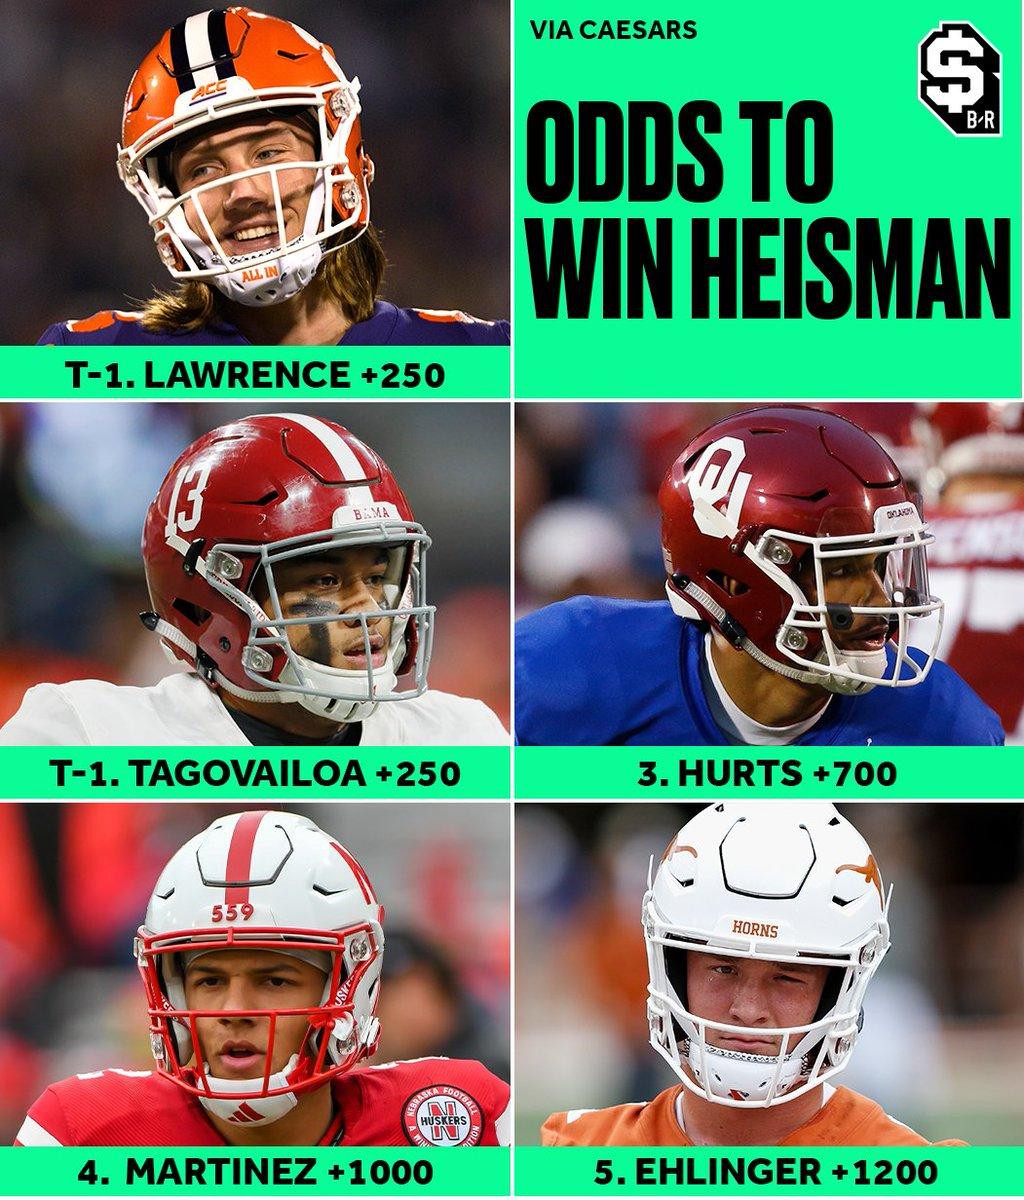 New 2019 Heisman Trophy Odds Name 5 Favorites